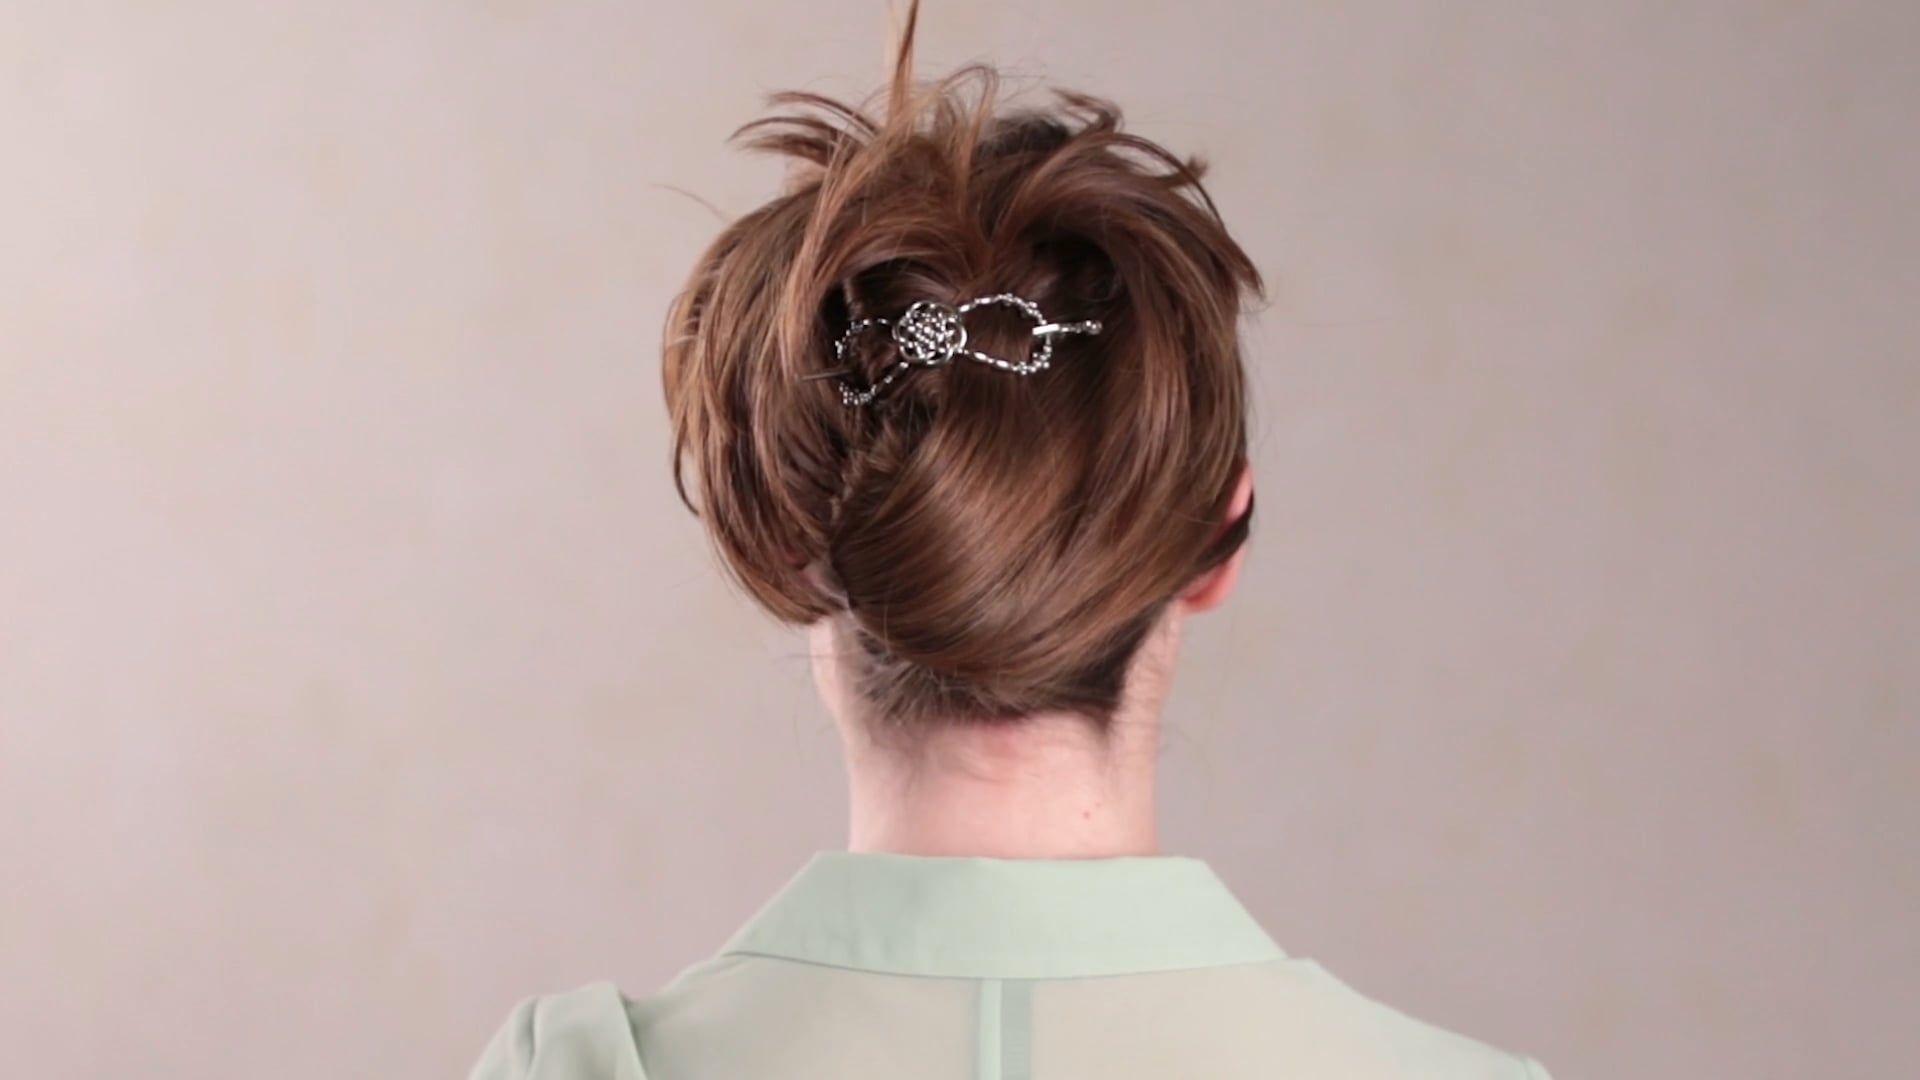 105 Best Tips, Tricks, & Tutorials images | Hair hacks, Hair, Hair ...